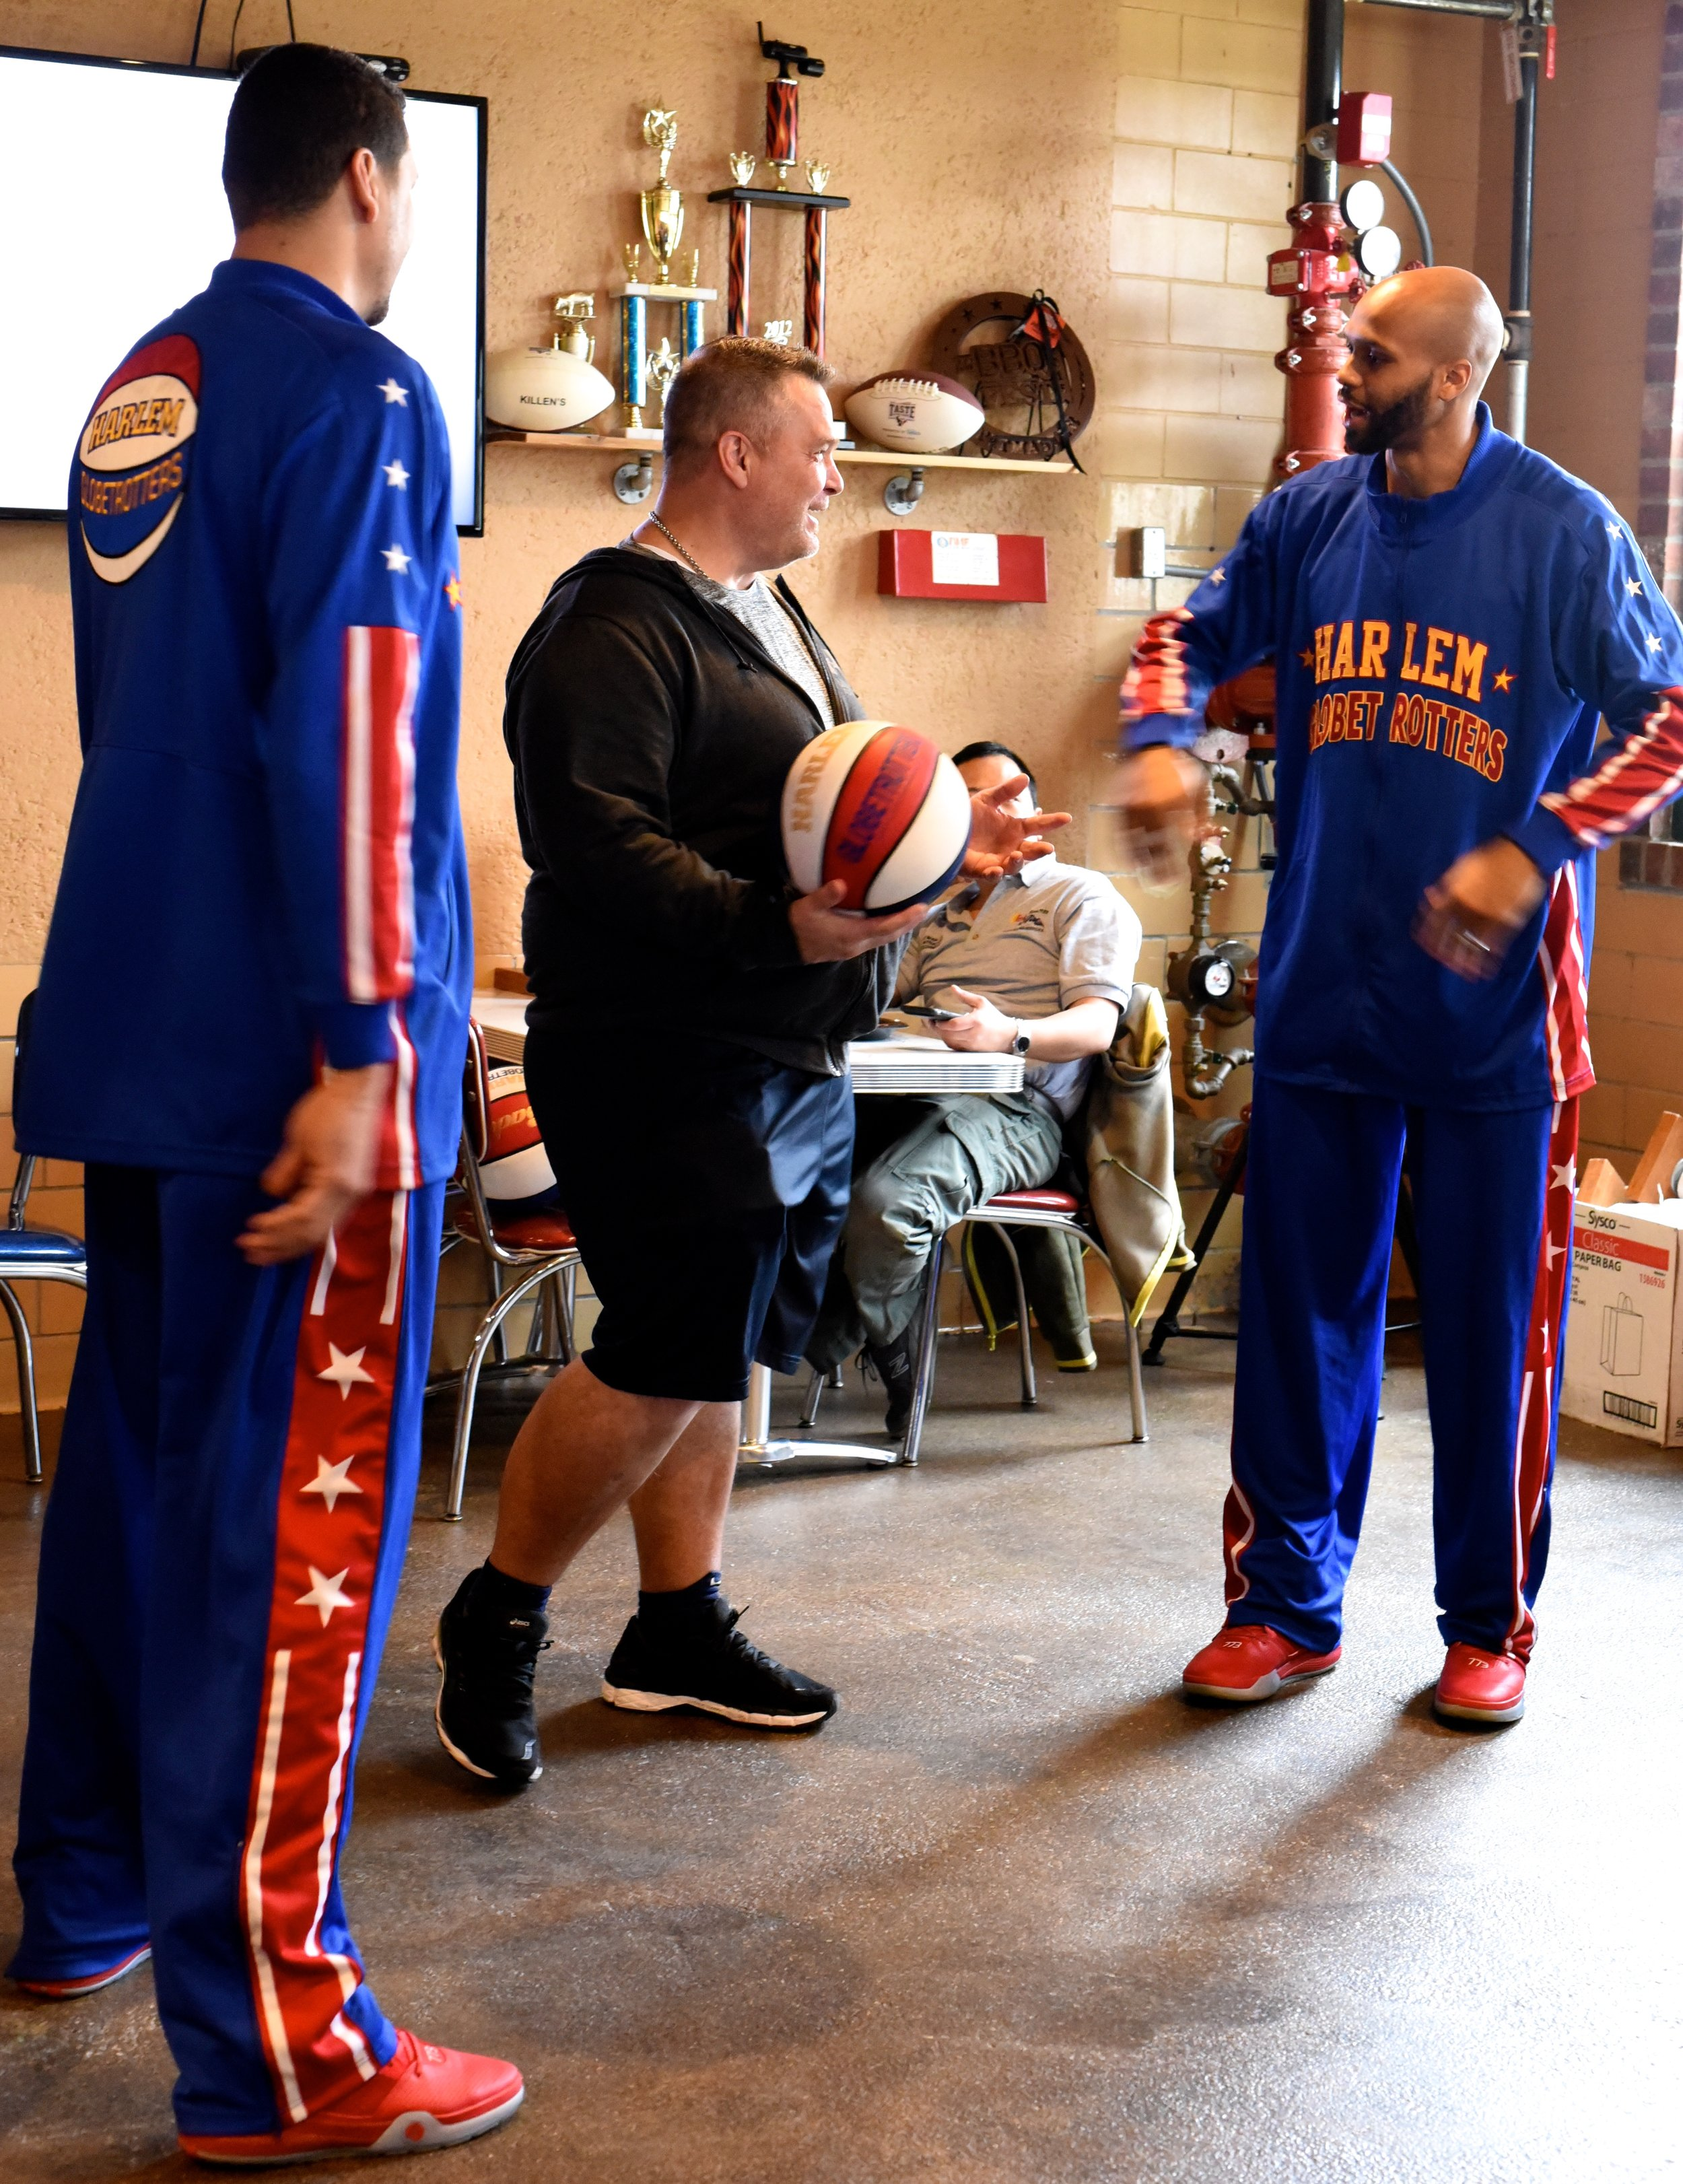 Harlem Globetrotters by Kimberly Park 01.27.16 (3).jpg